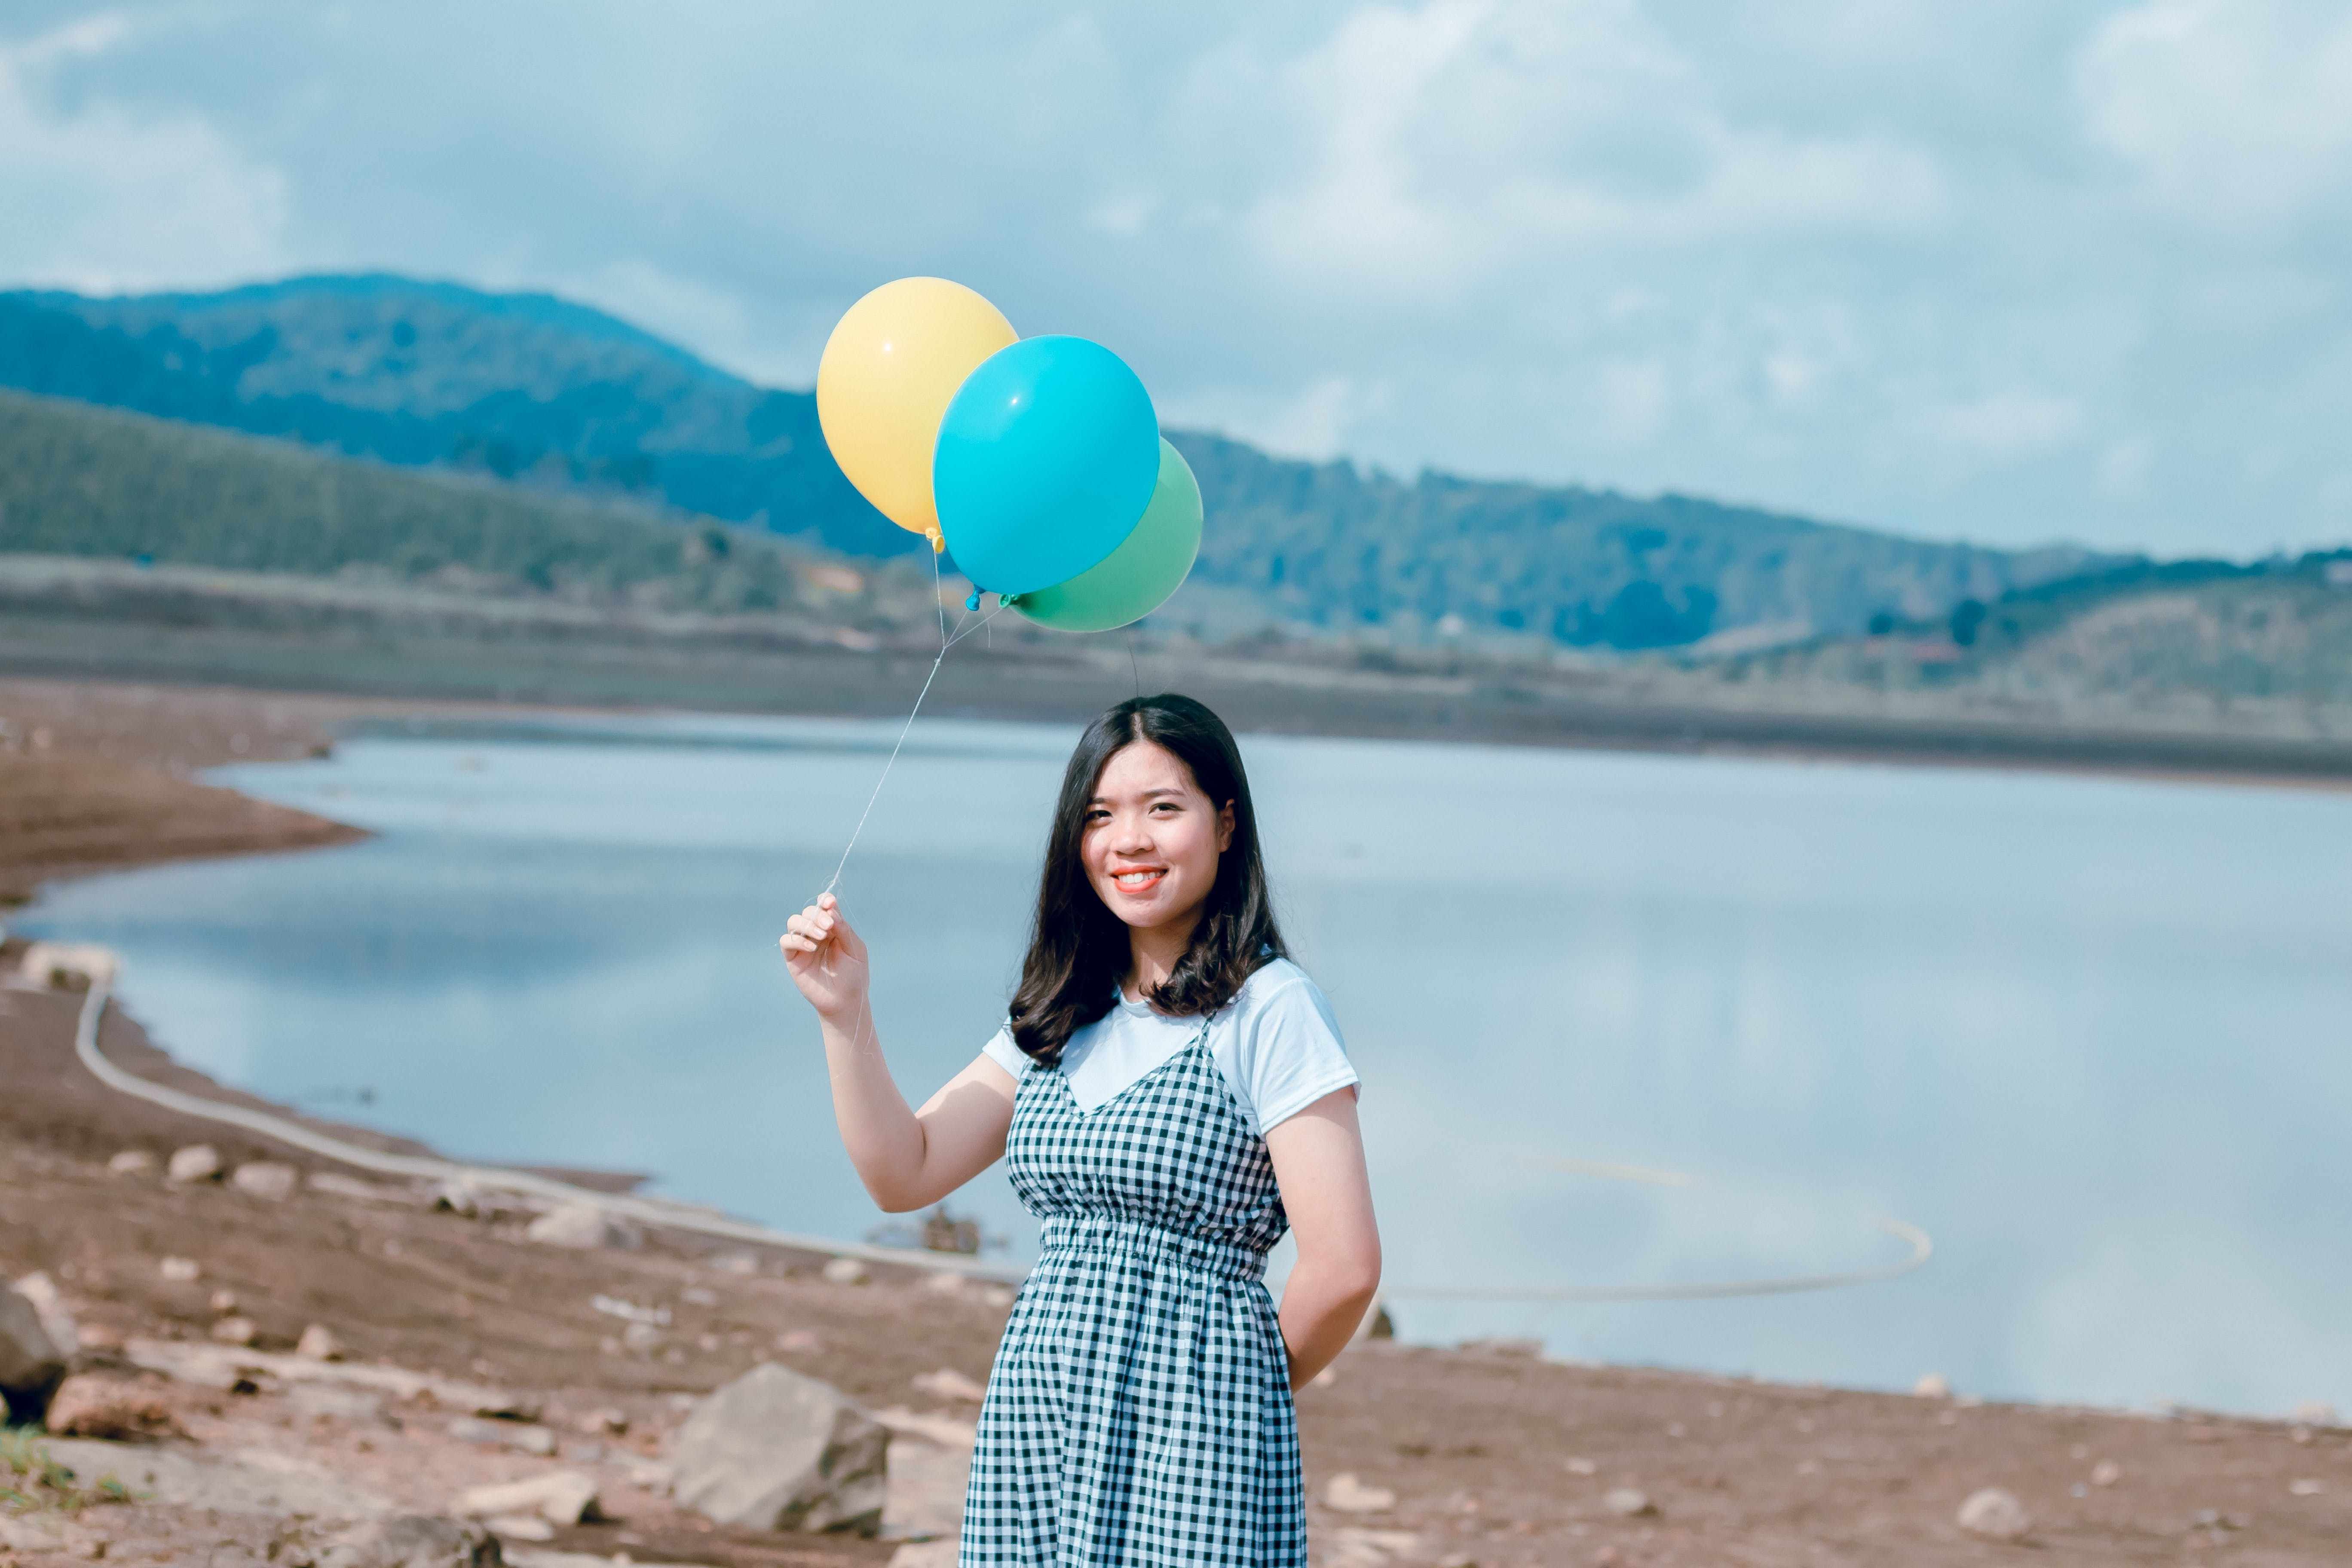 Woman Near Seashore Holding Balloons